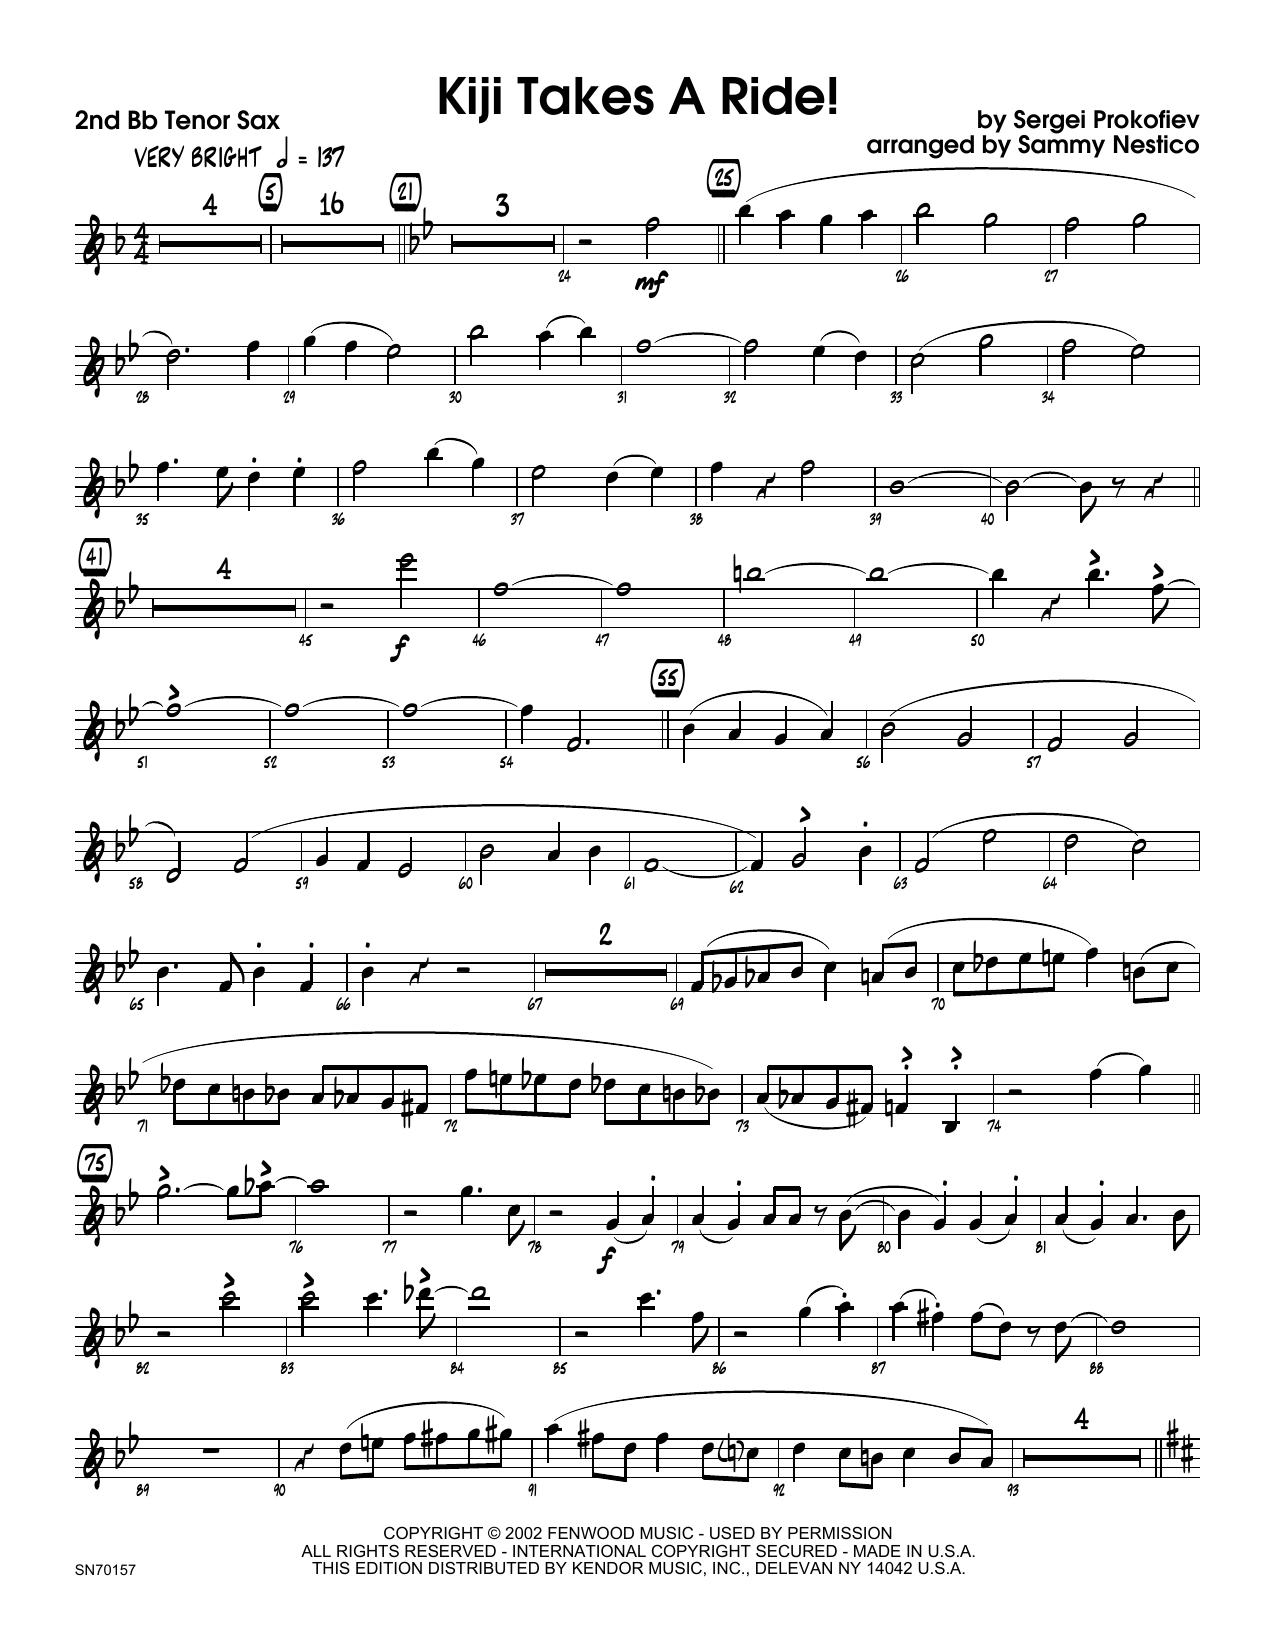 Kiji Takes A Ride! - 2nd Bb Tenor Saxophone Sheet Music